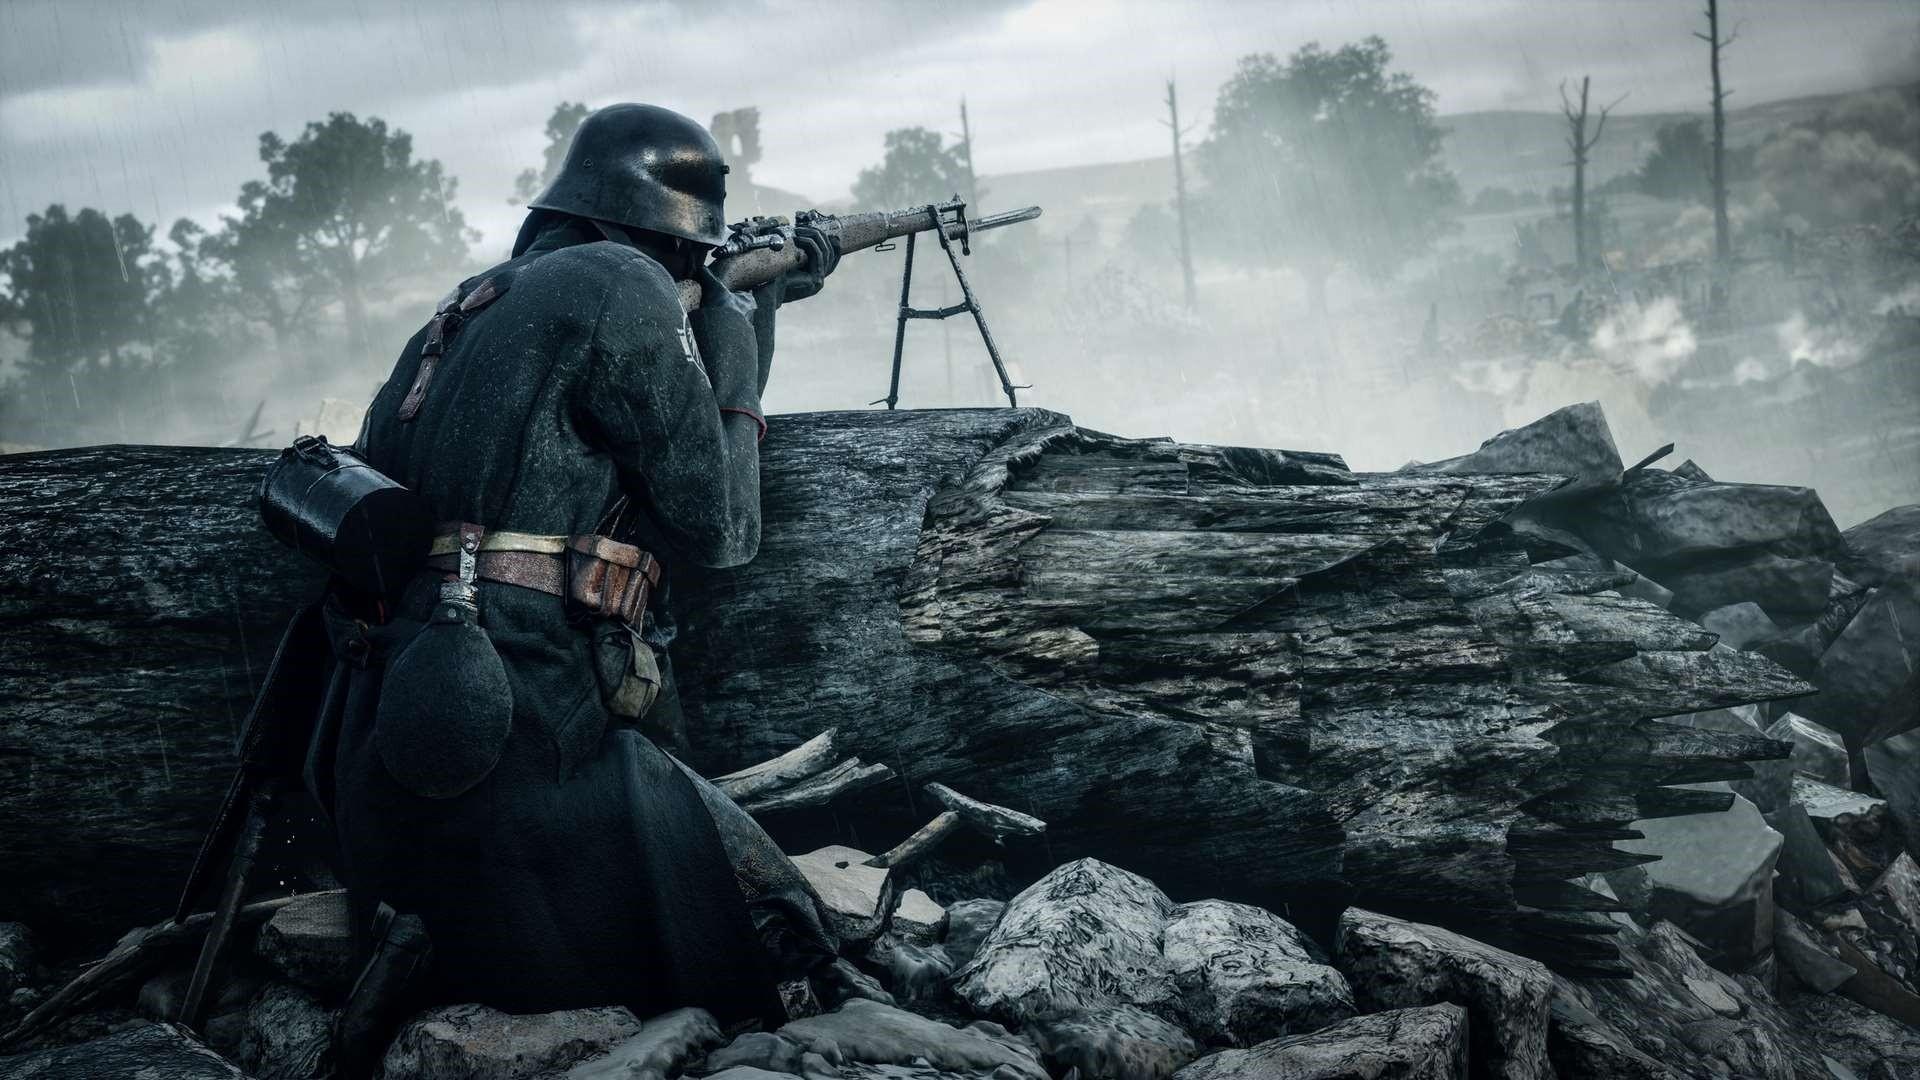 Battlefield 1 Wallpaper Picture